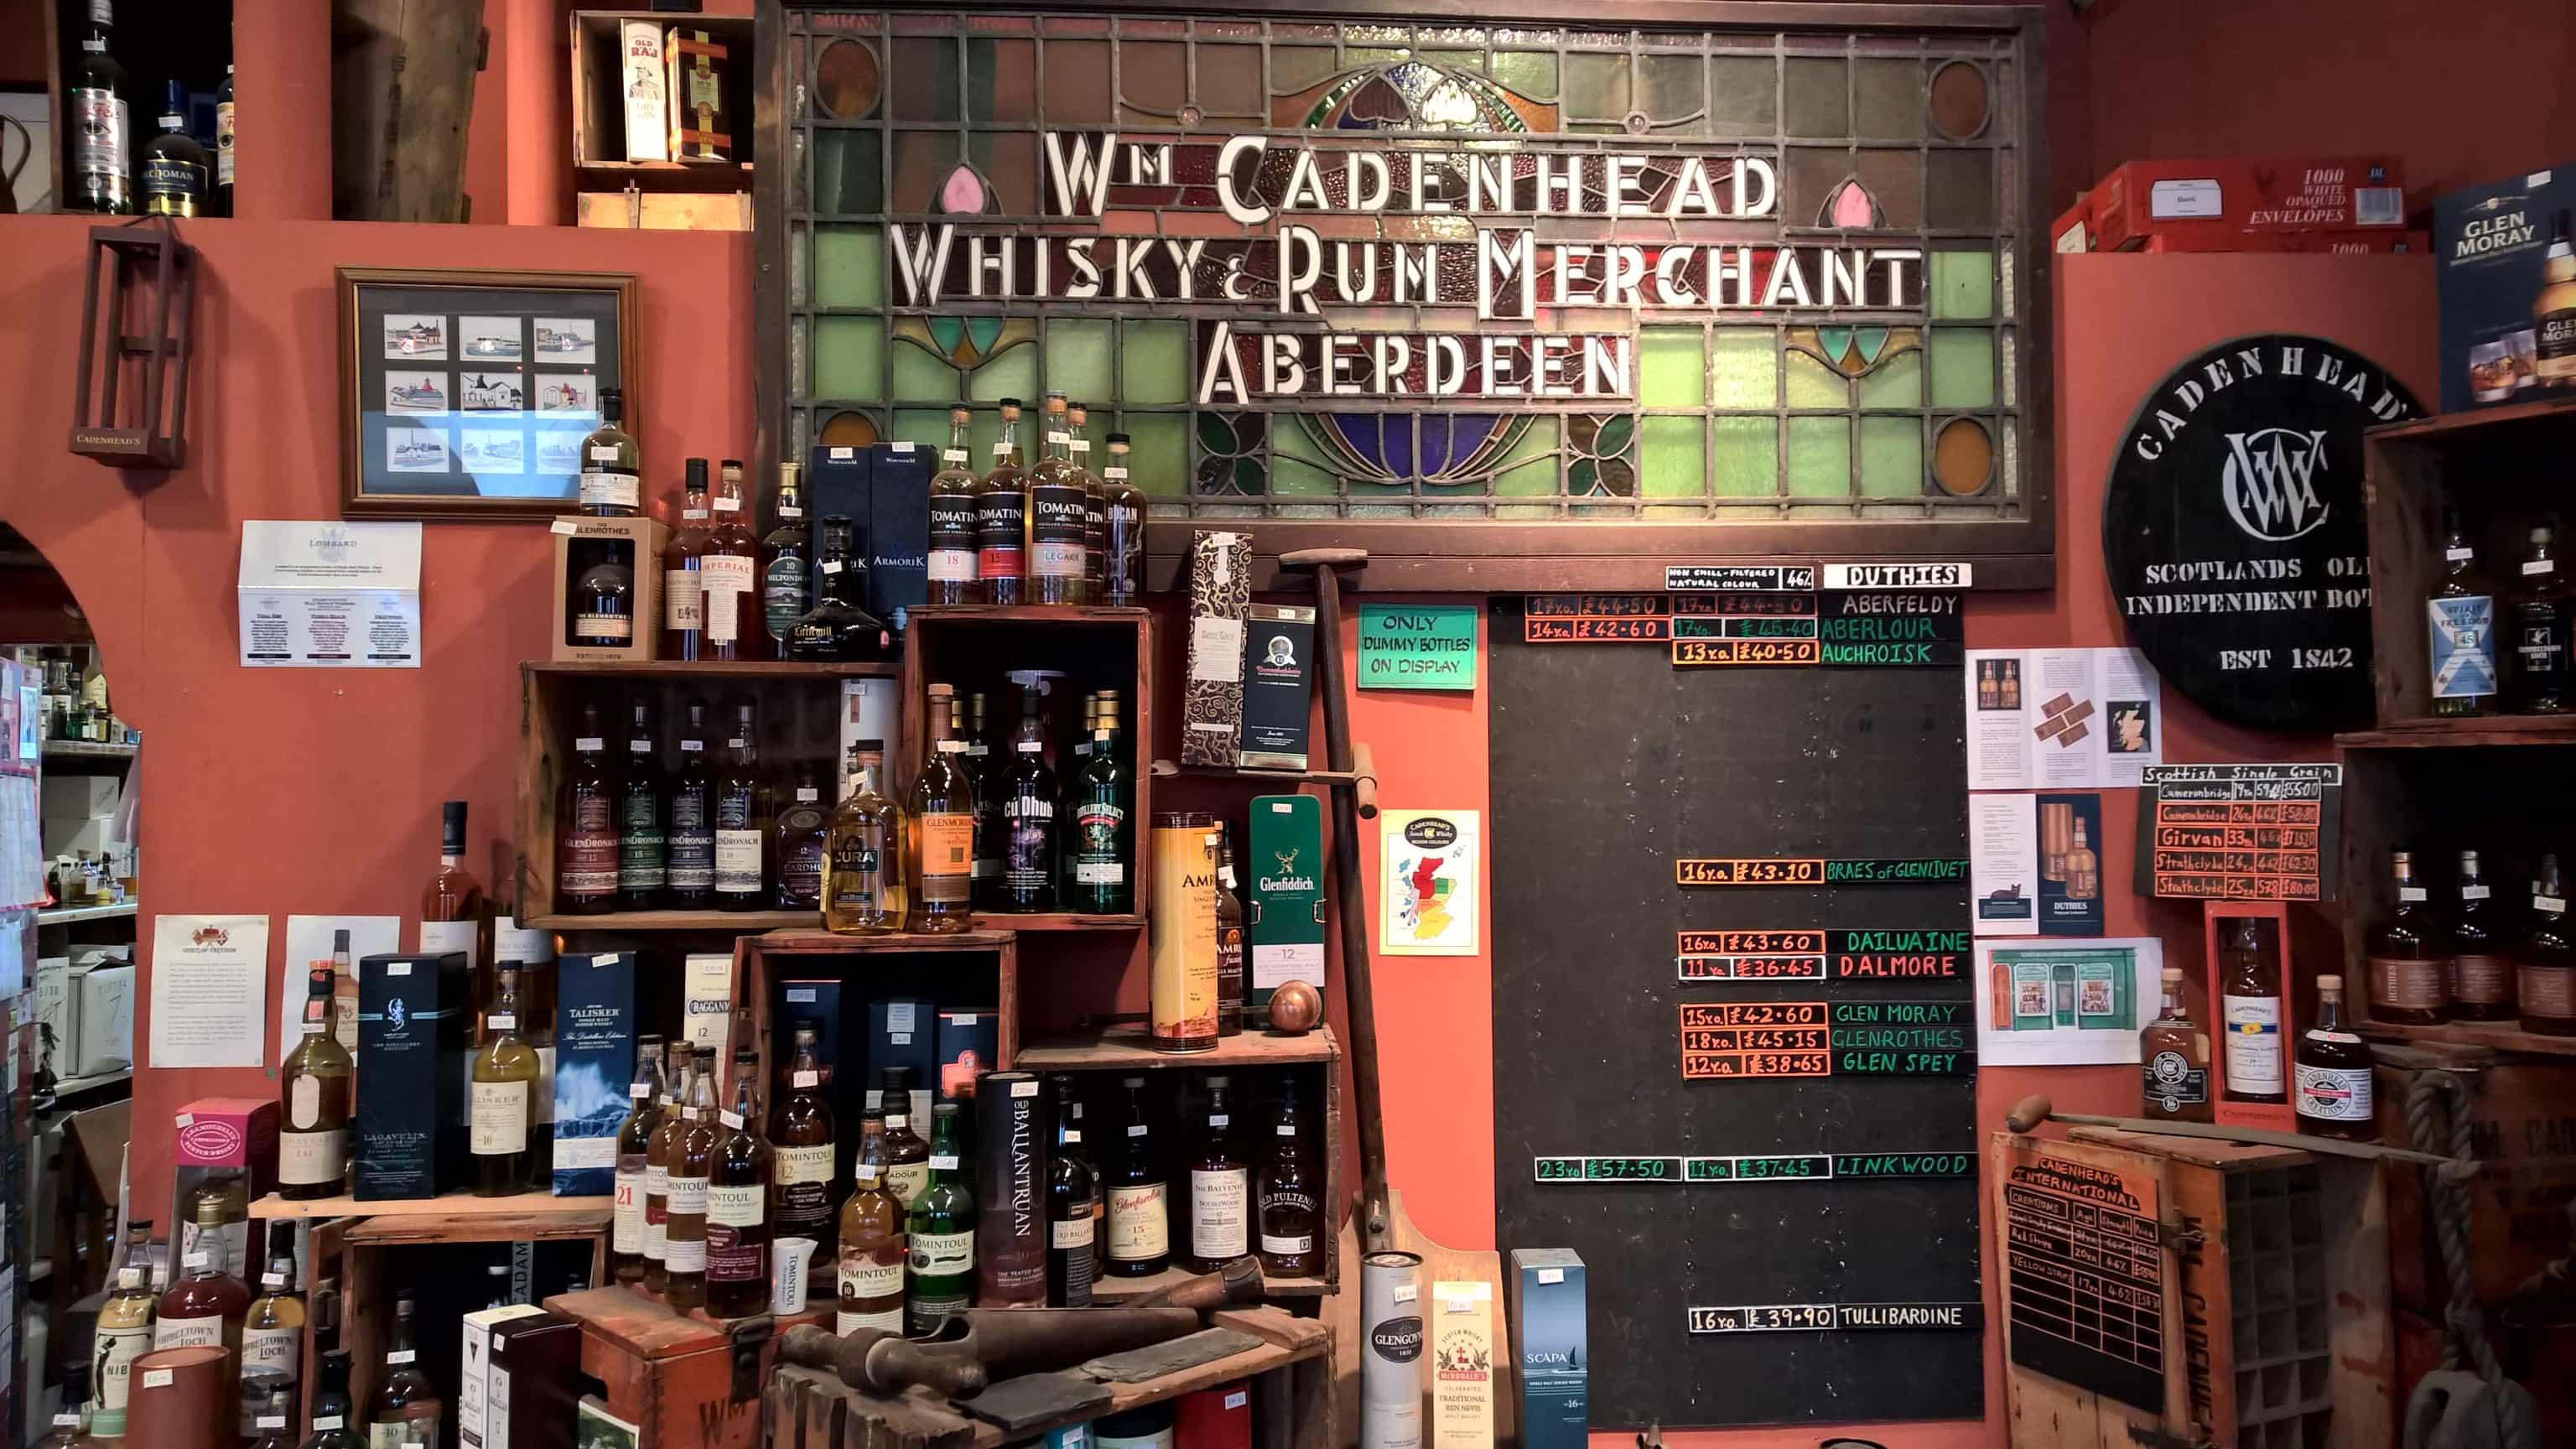 Cadenhead's shop